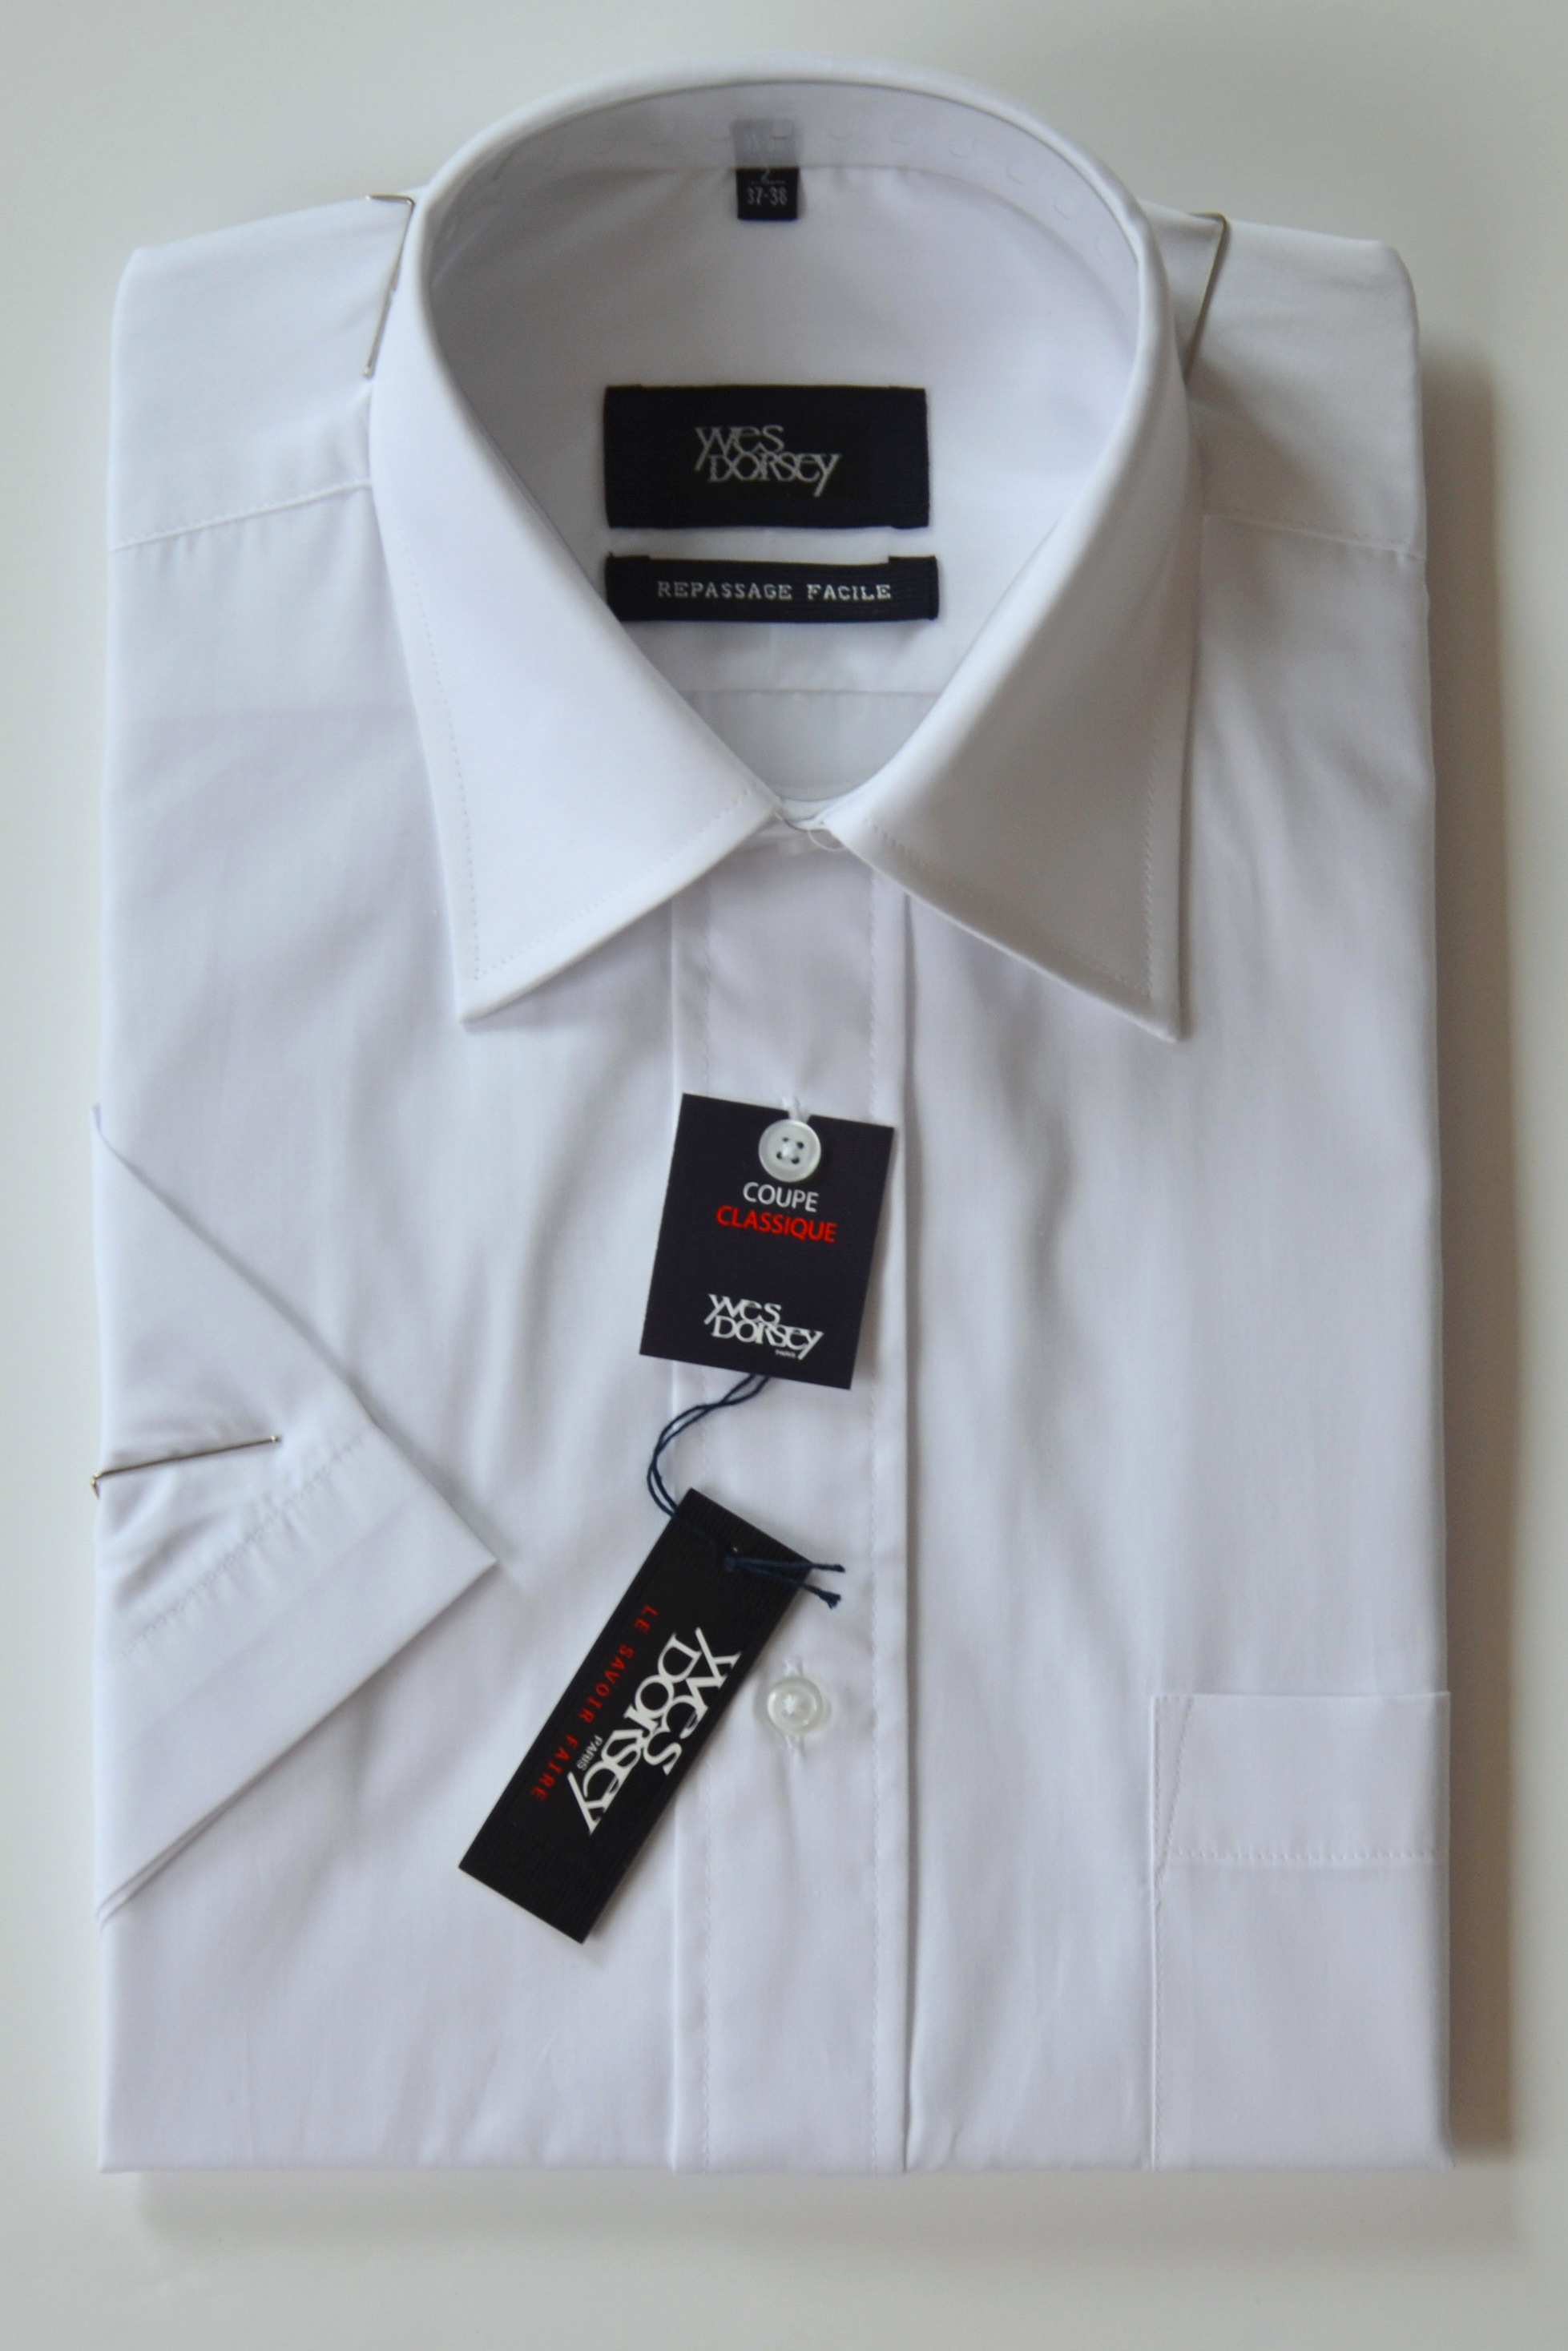 Prestige diffusion chemise repassage facile manches - Chemise coupe droite homme ...